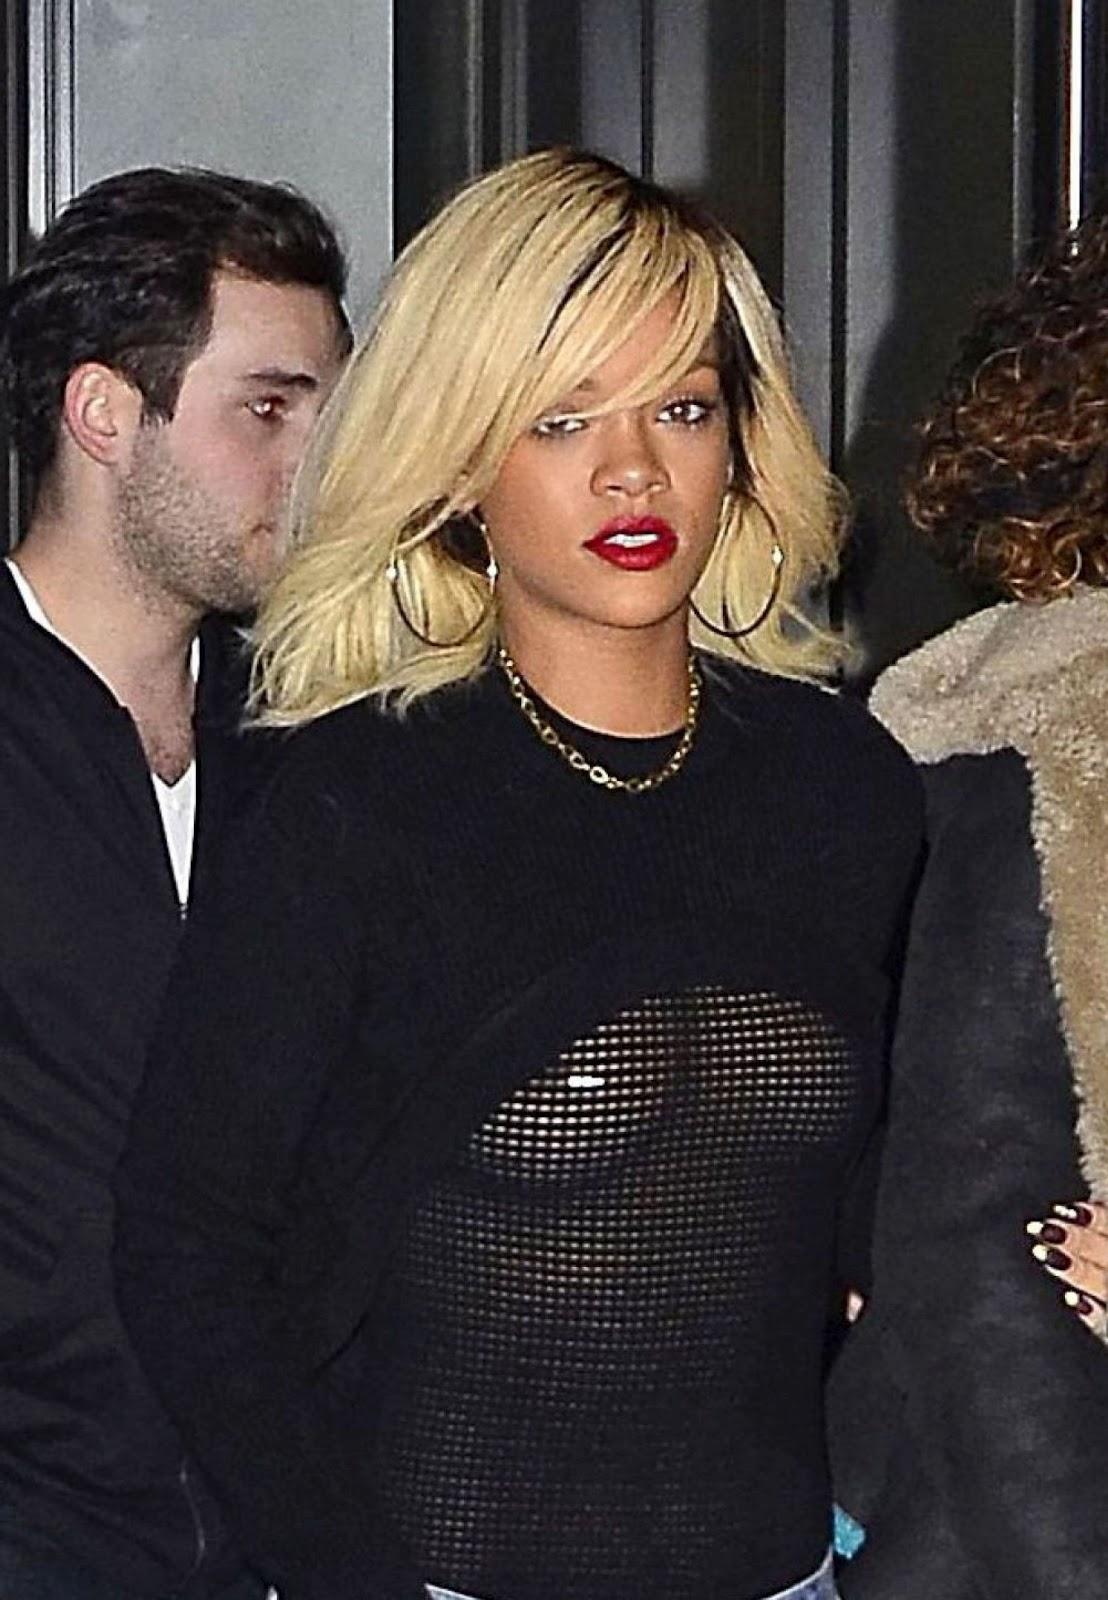 http://1.bp.blogspot.com/-nopnwfZxDKM/T2IcthFSJGI/AAAAAAAAC2o/Nk9KBtuG0Ws/s1600/Rihanna-11.jpg